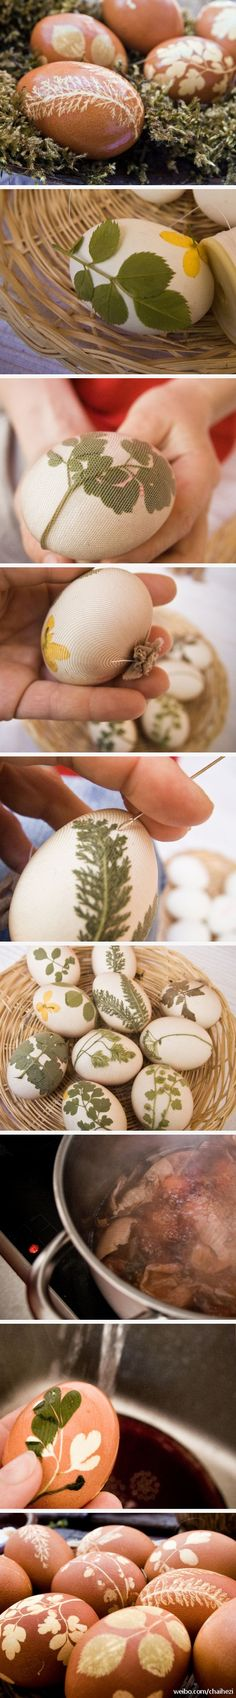 Easter Egg Nature